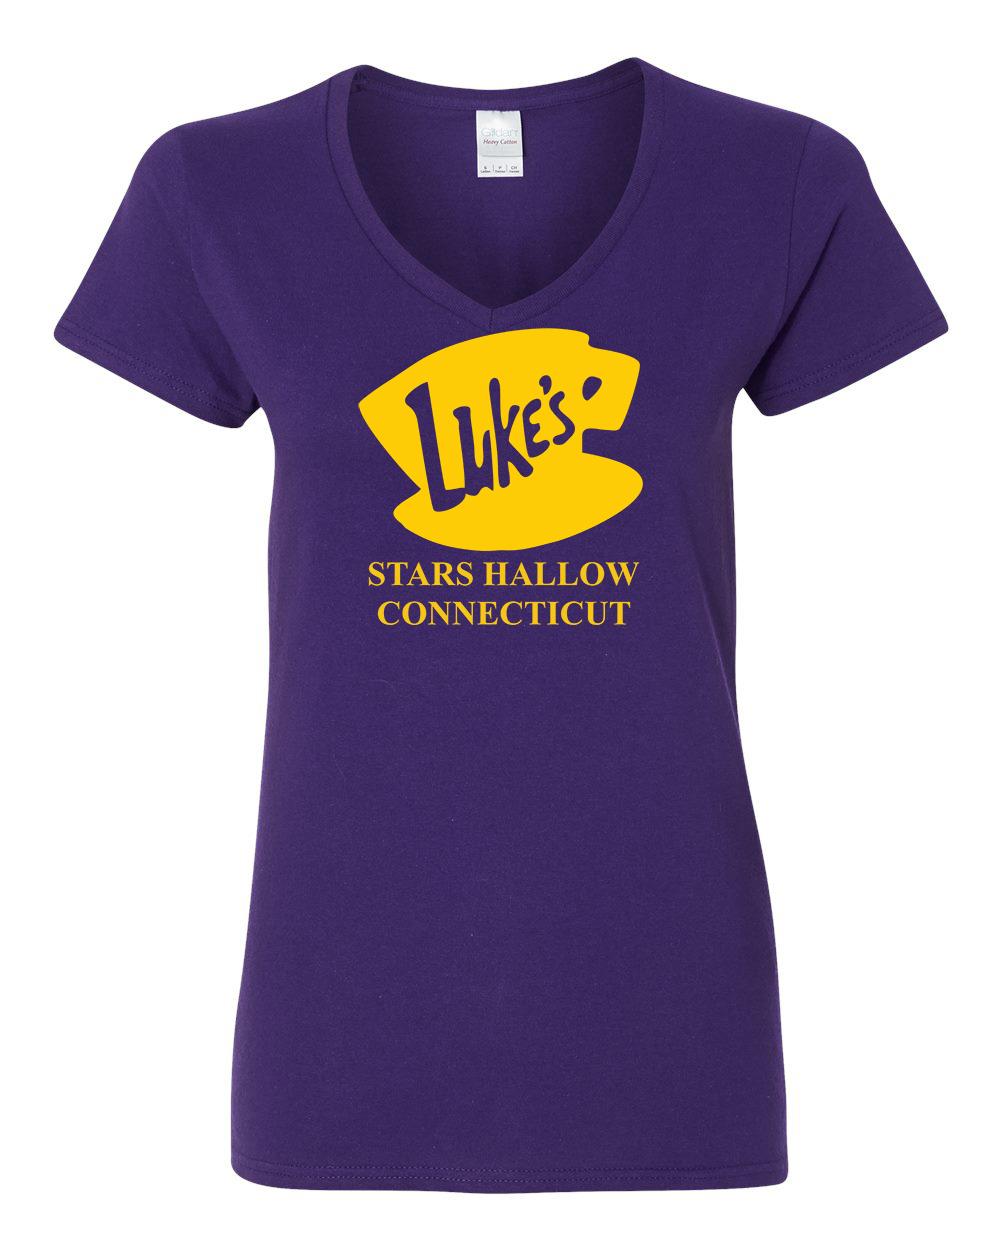 Luke's Diner Stars Hollow CT Gilmore Girls Womens V Neck T-Shirt Top by